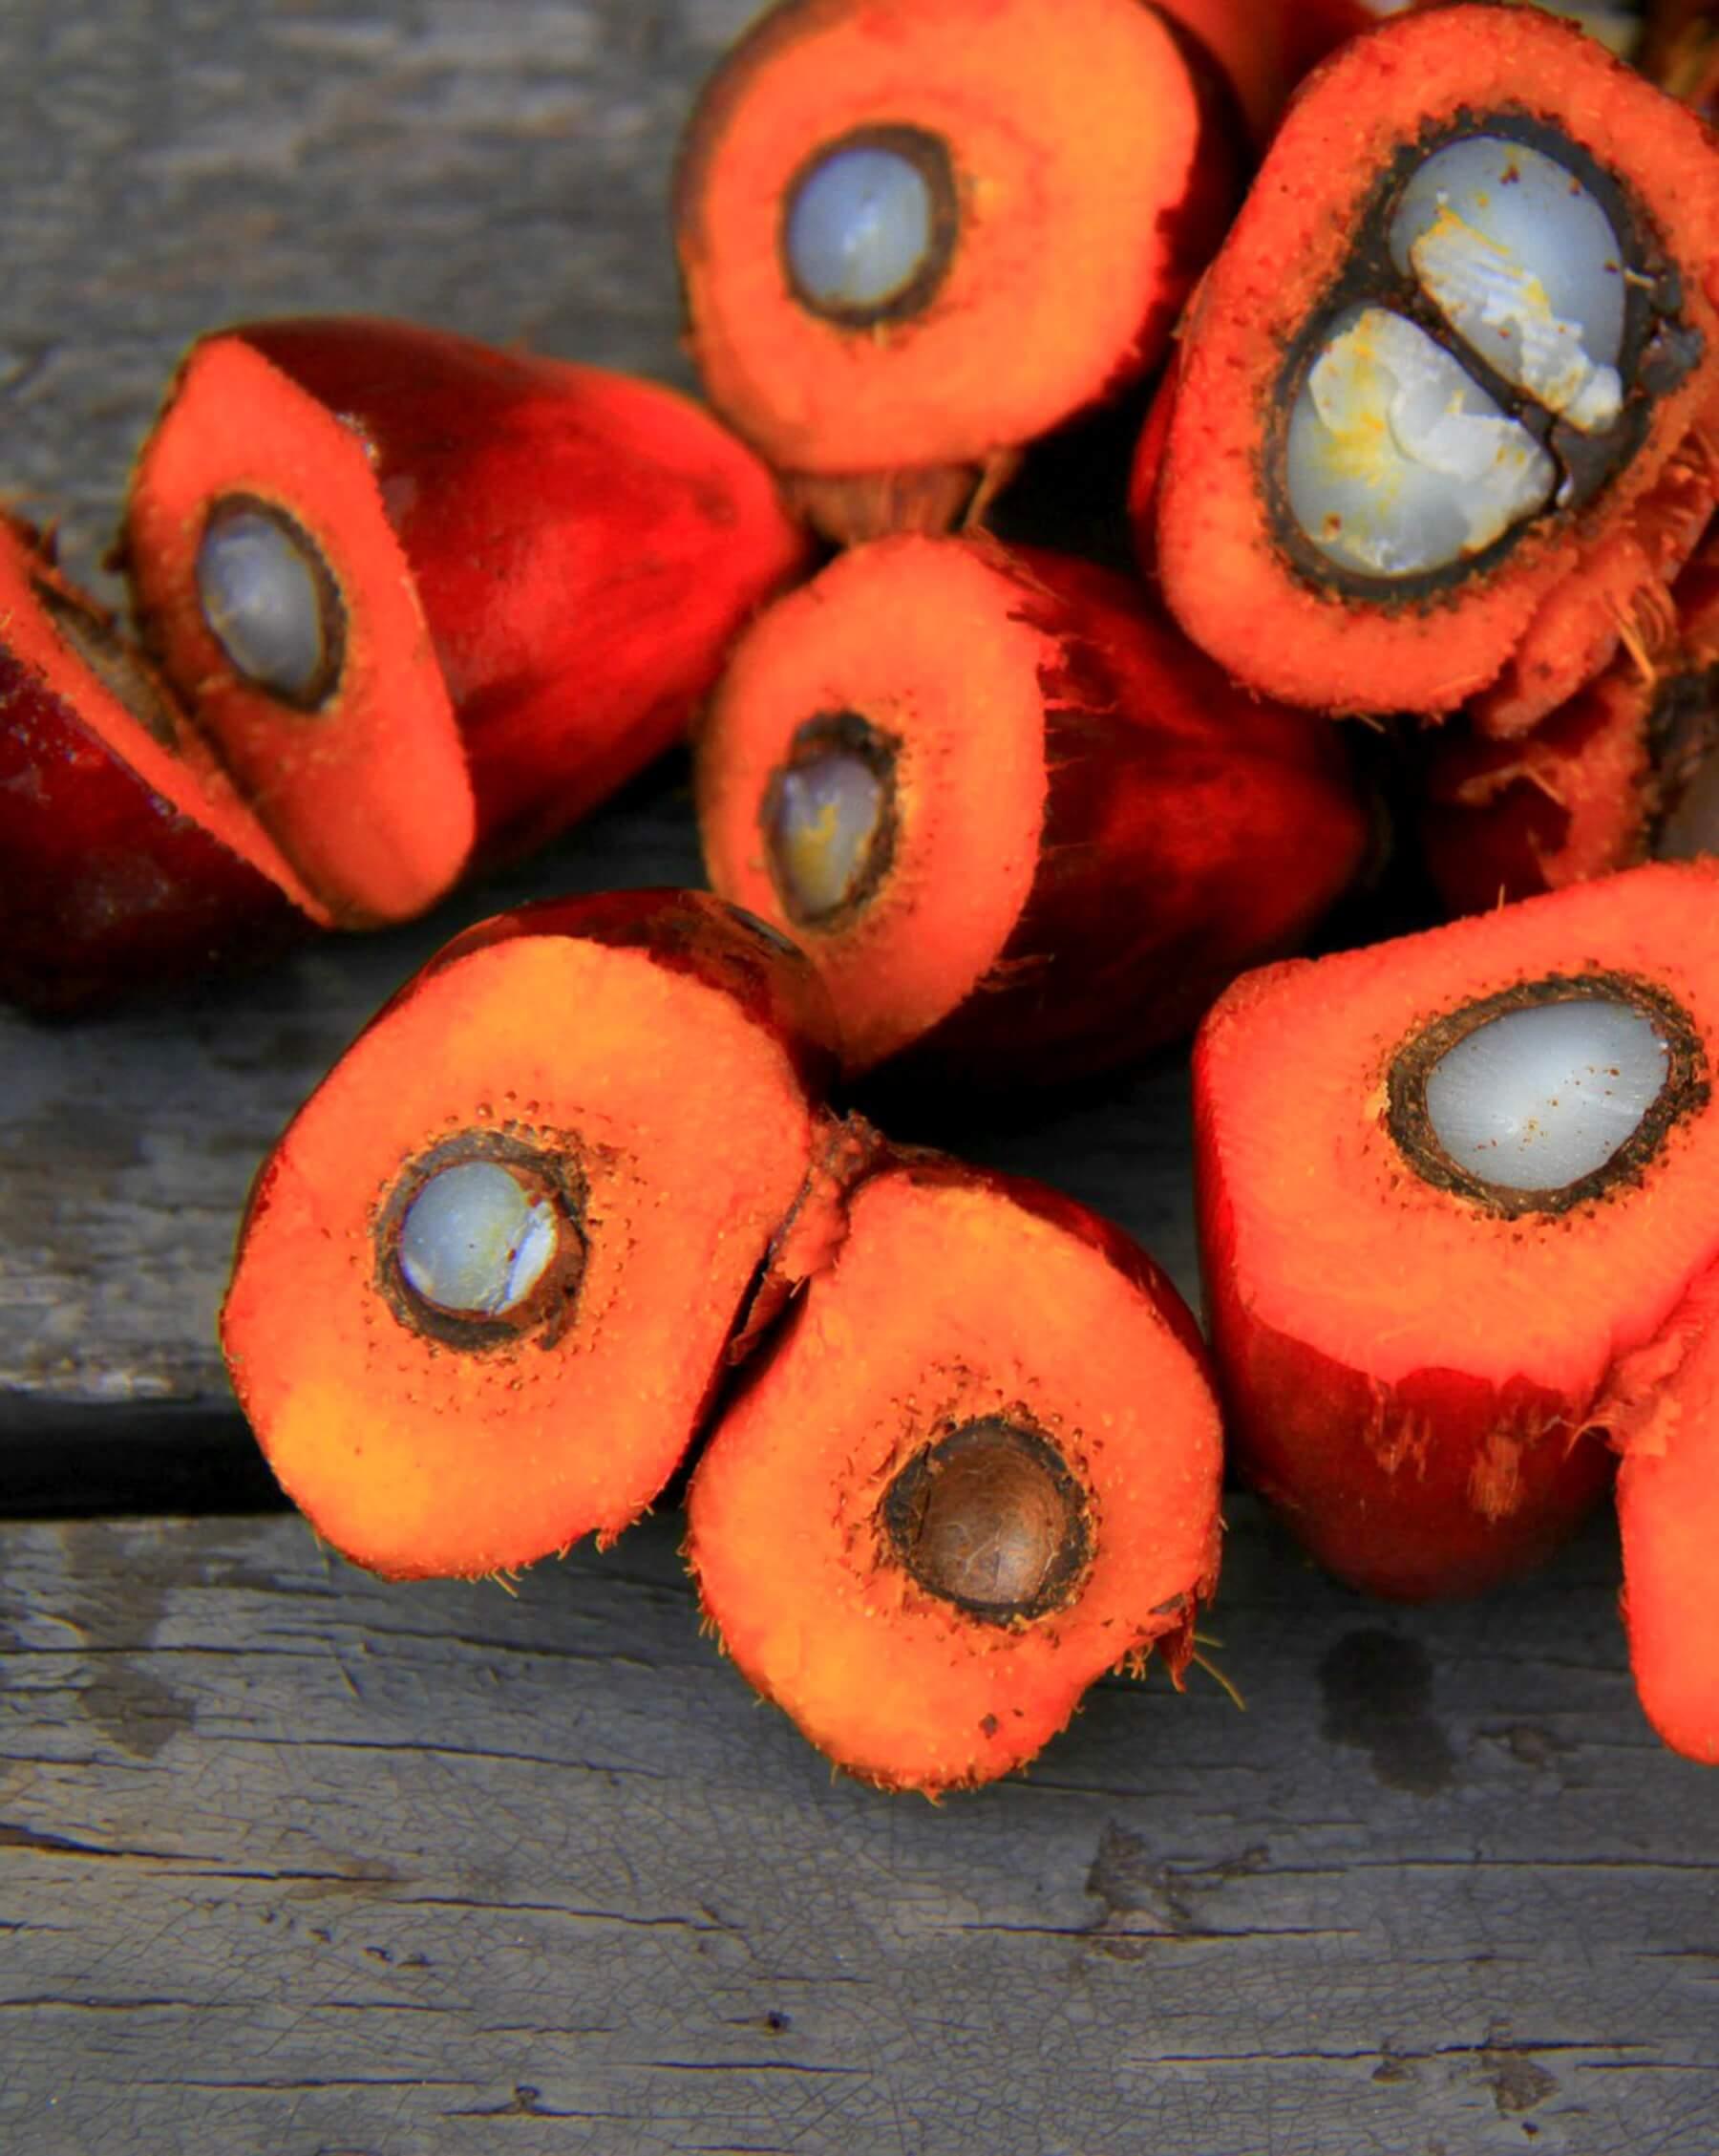 Pile of cut open Palm Oil Fruit